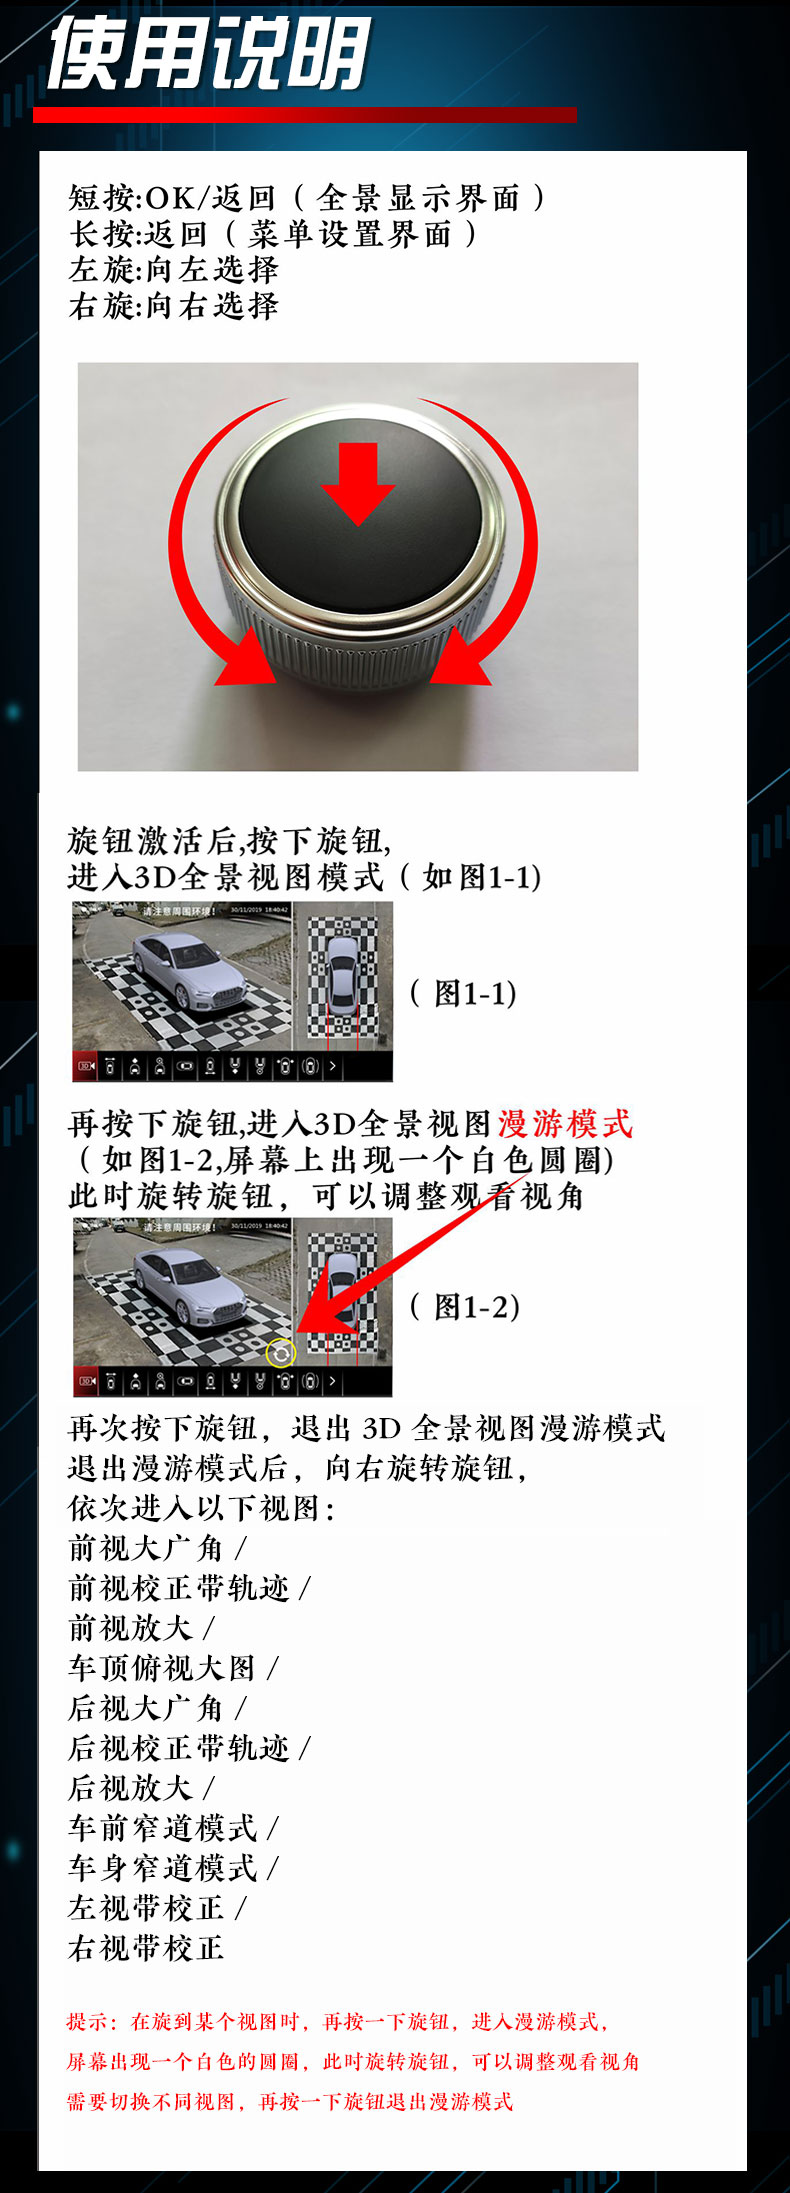 X20詳情頁使用說明與產品清單_01.jpg